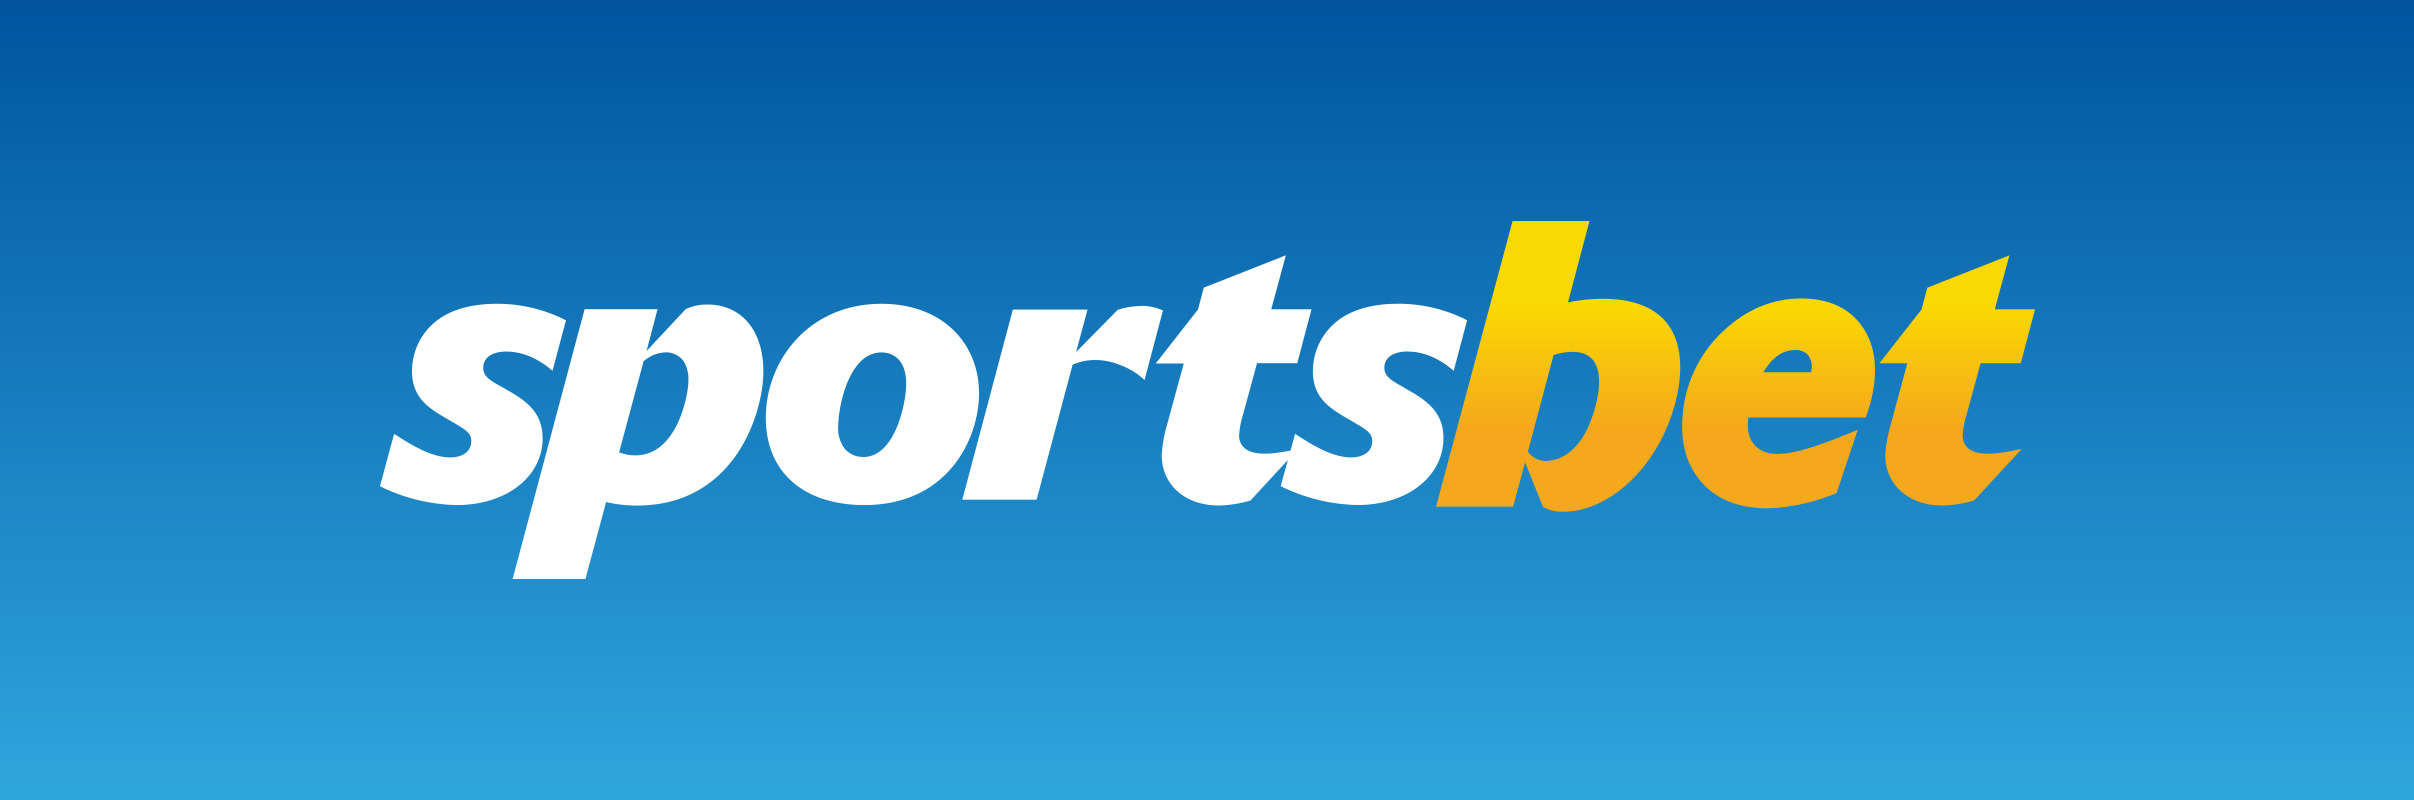 Sportsbet Logo.jpg